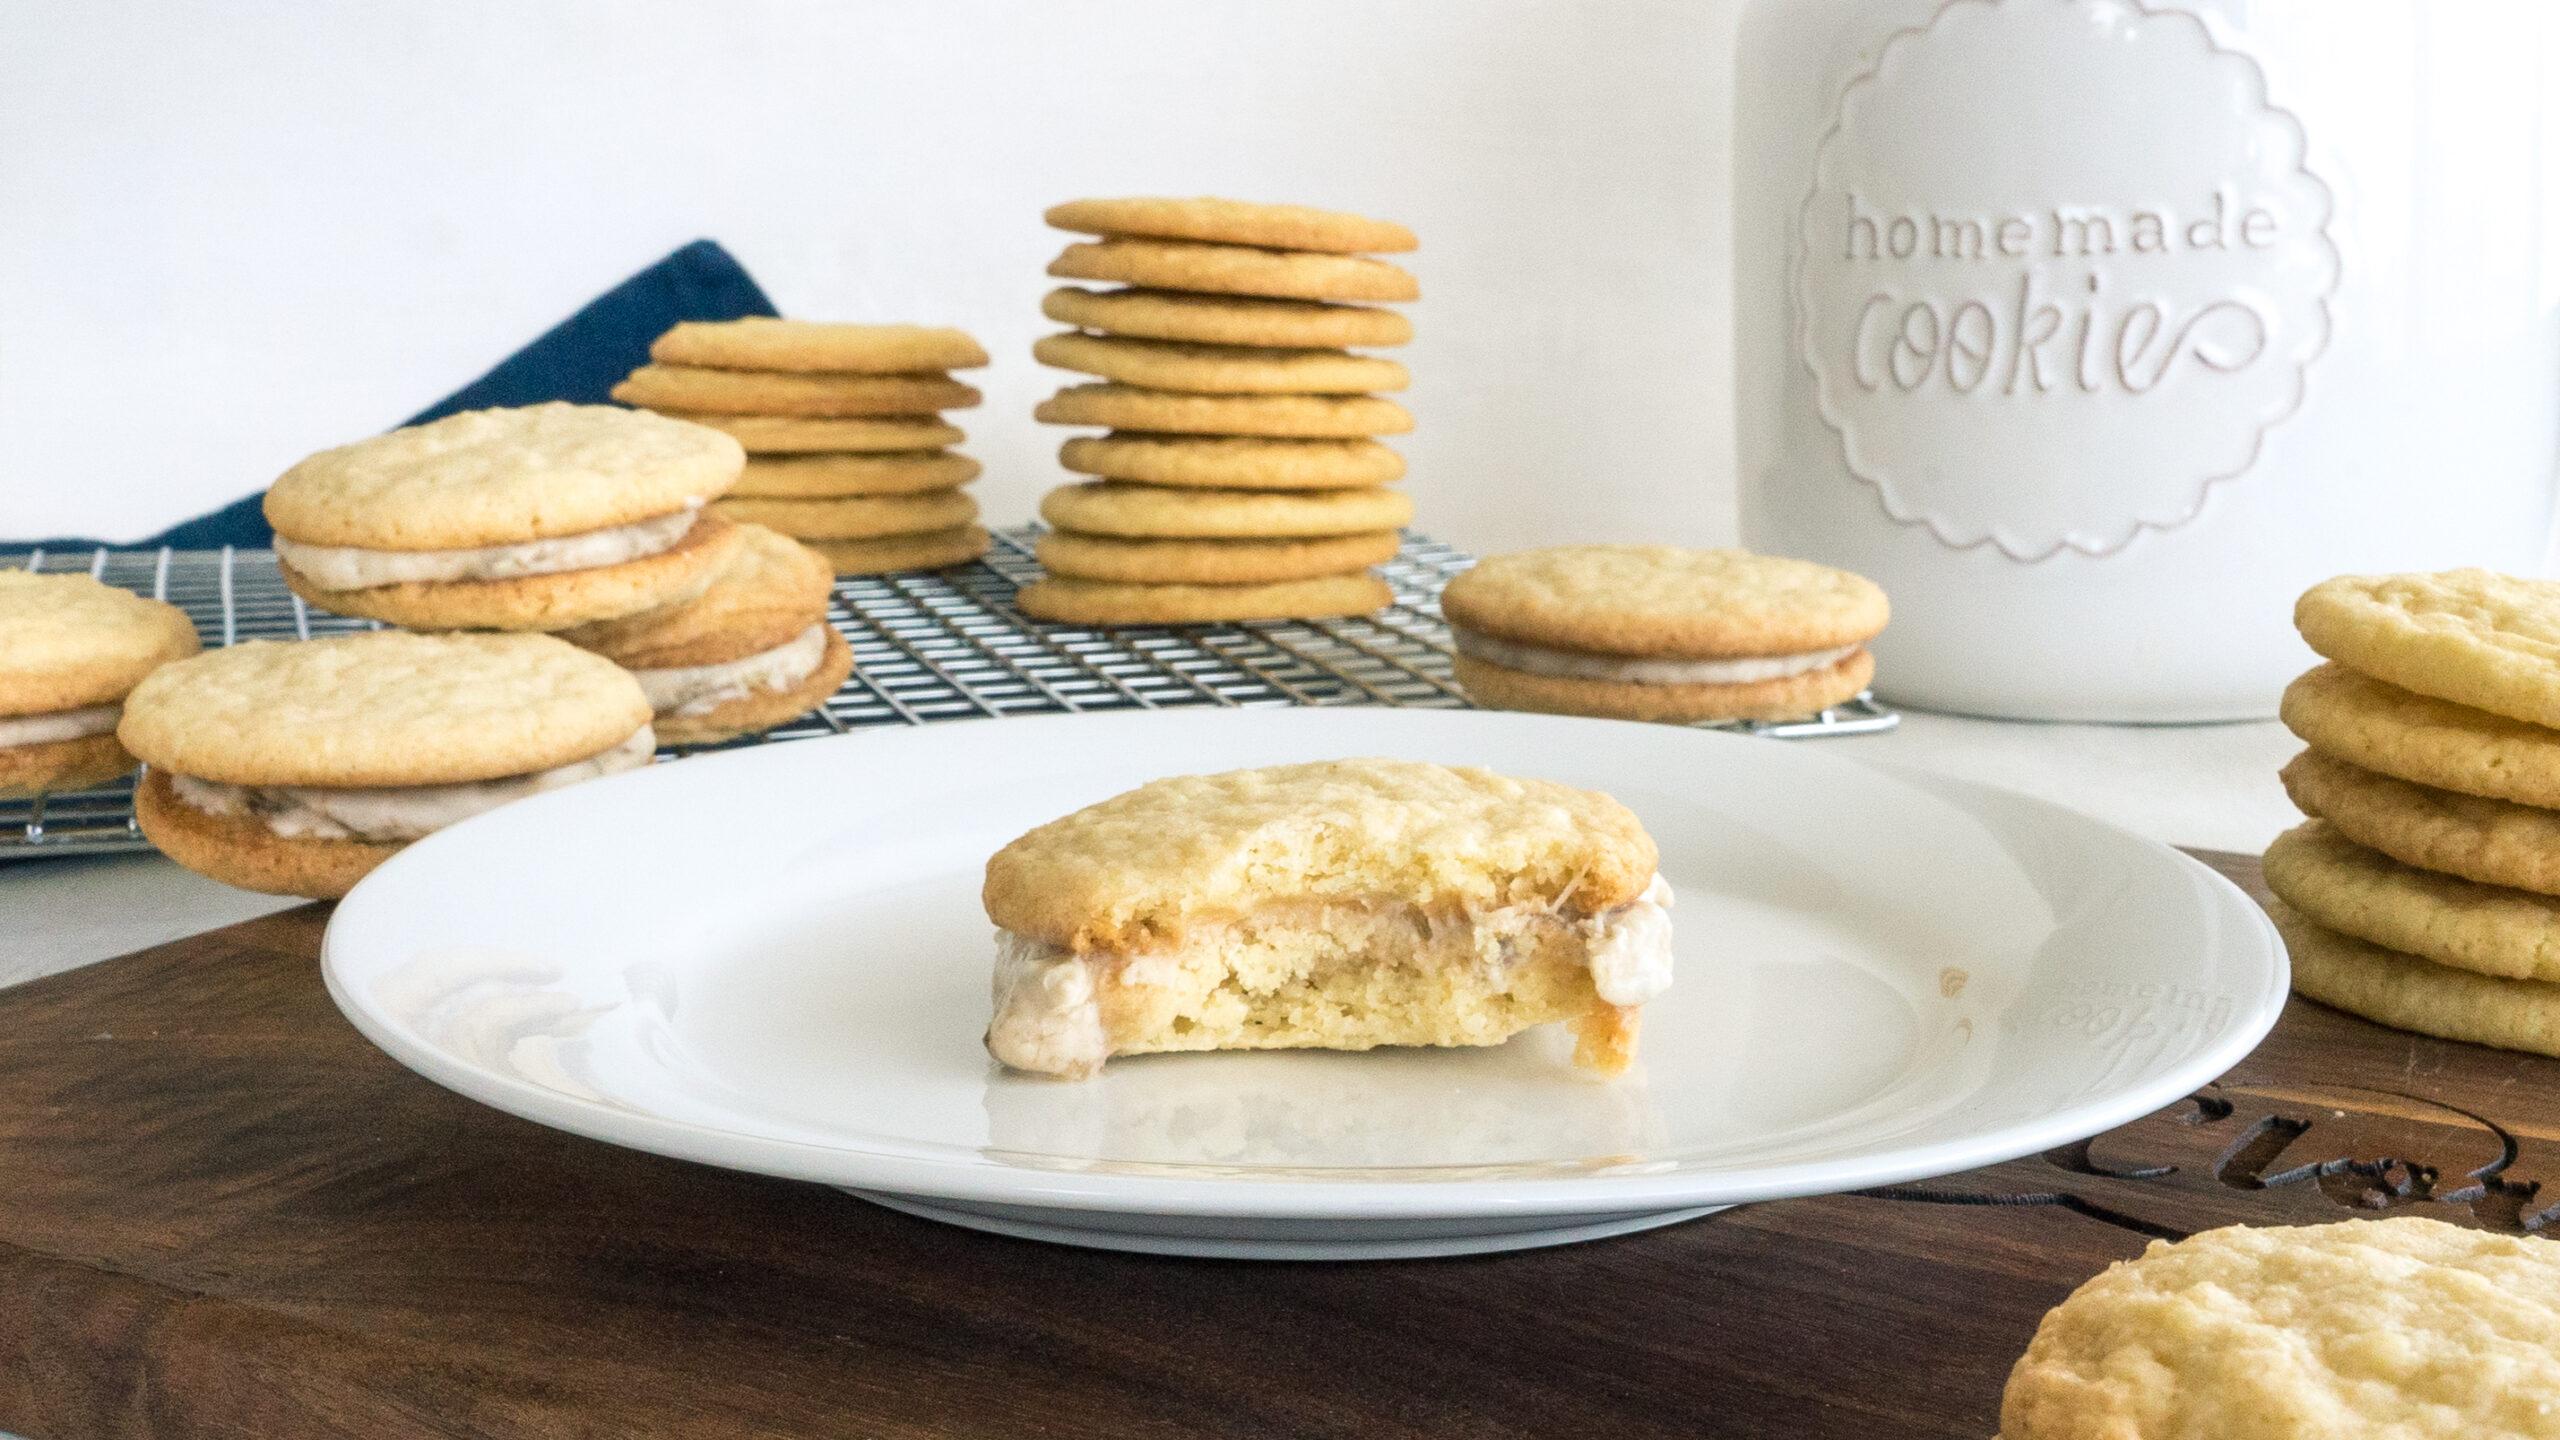 Banana Cream Cookie Sandwiches